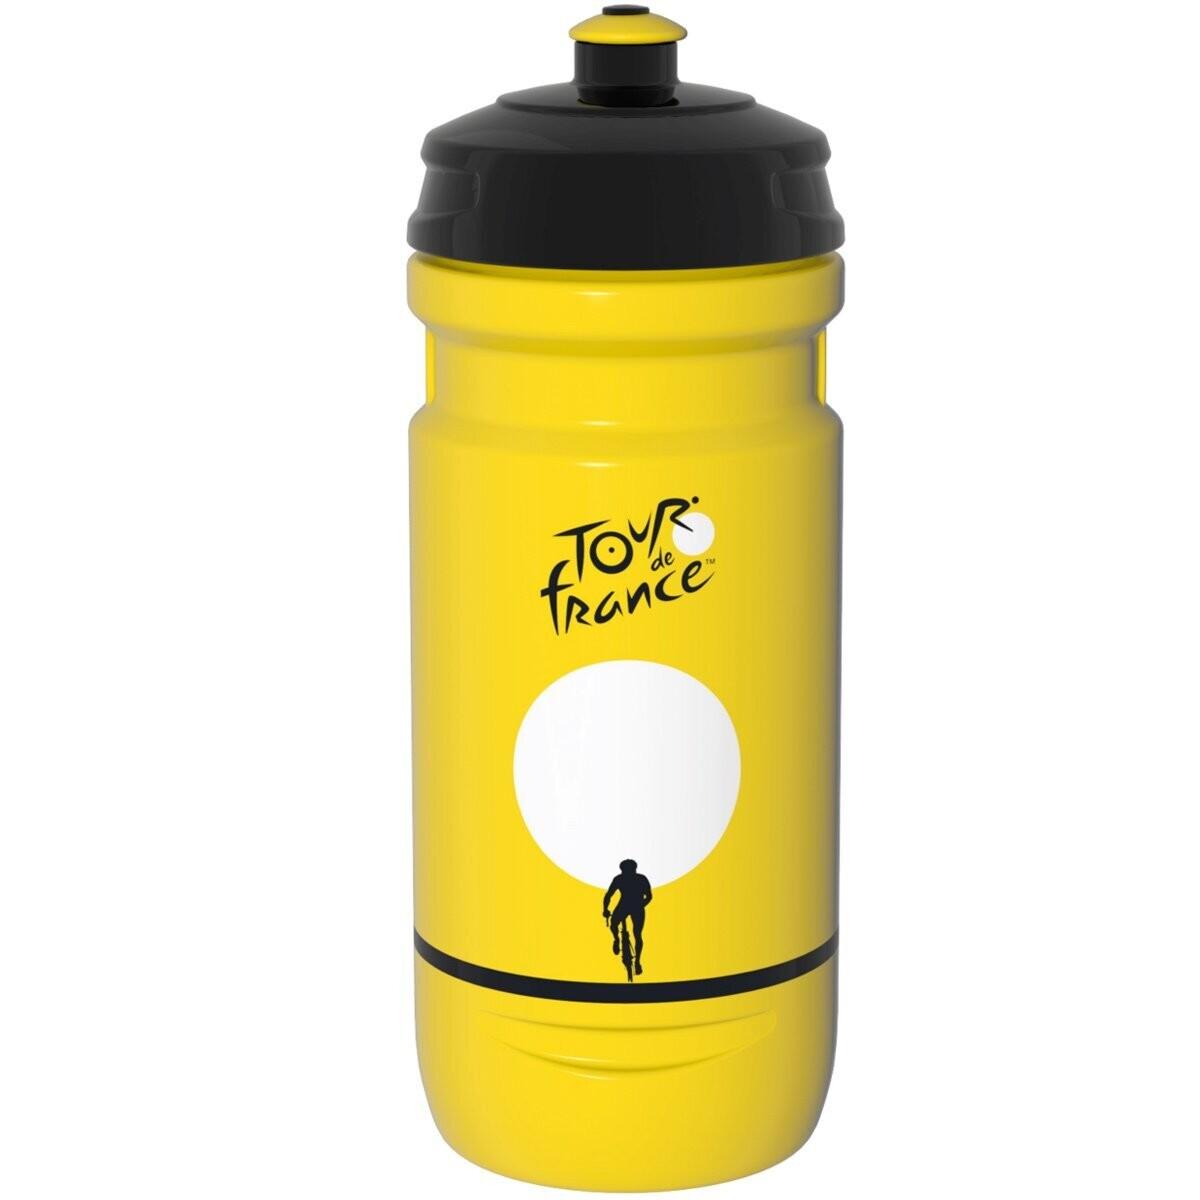 Bidon Tour de France jaune